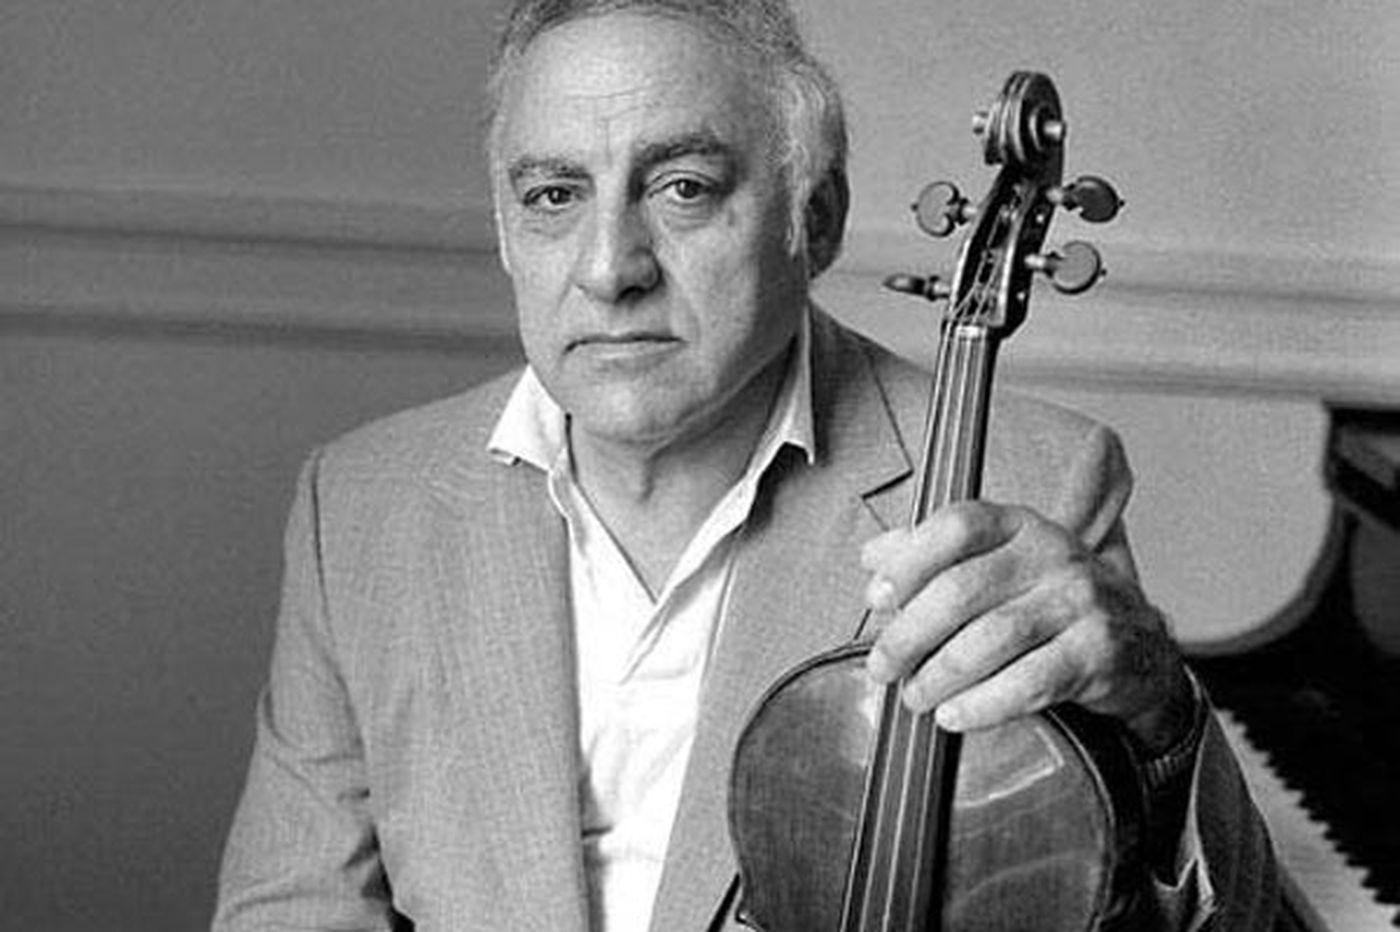 Noted violist Joseph de Pasquale dies at 95